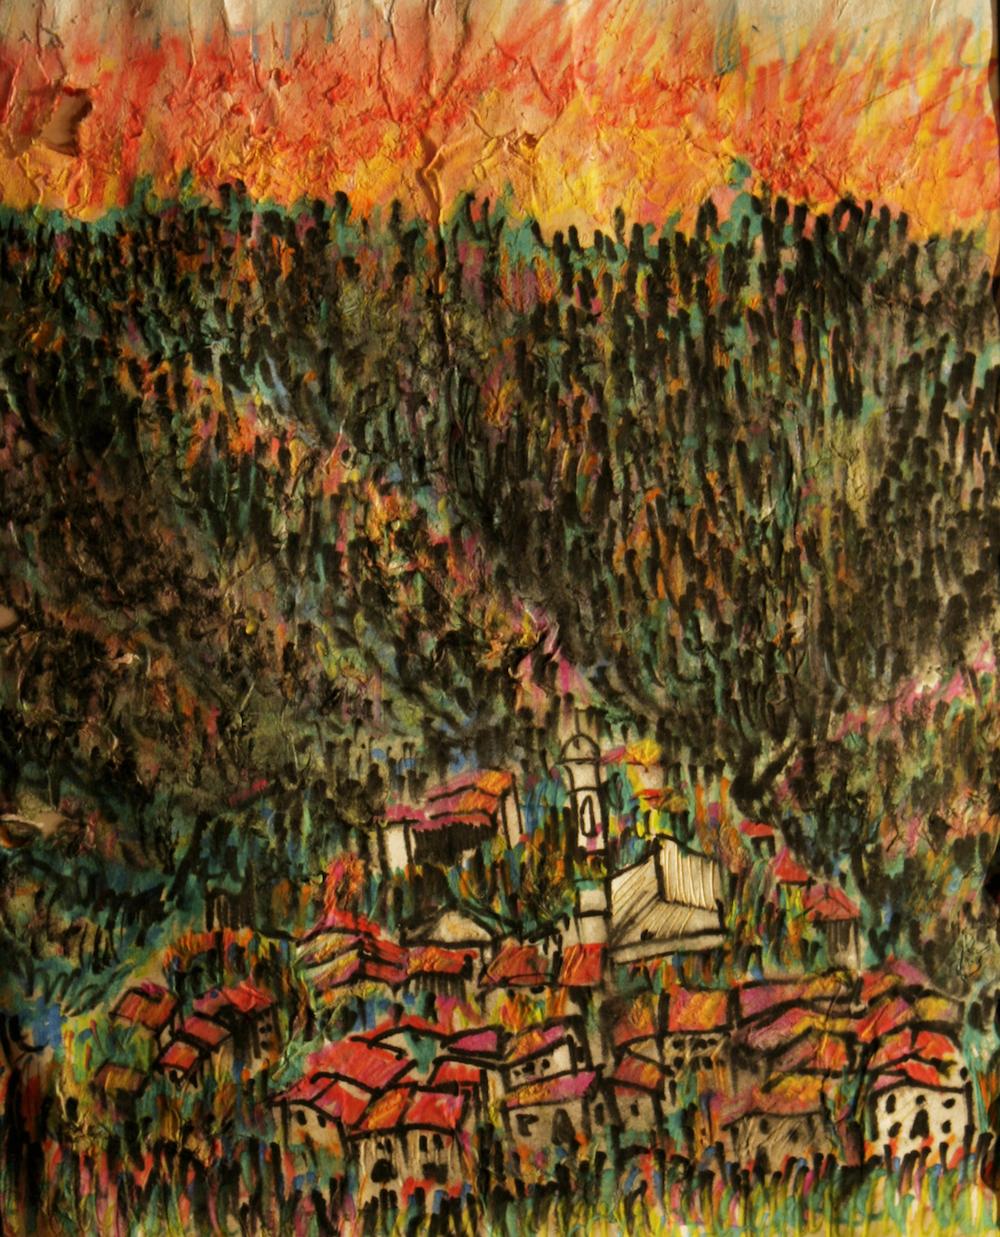 original drawing using water color pencils by cork artist, web site designer and developer